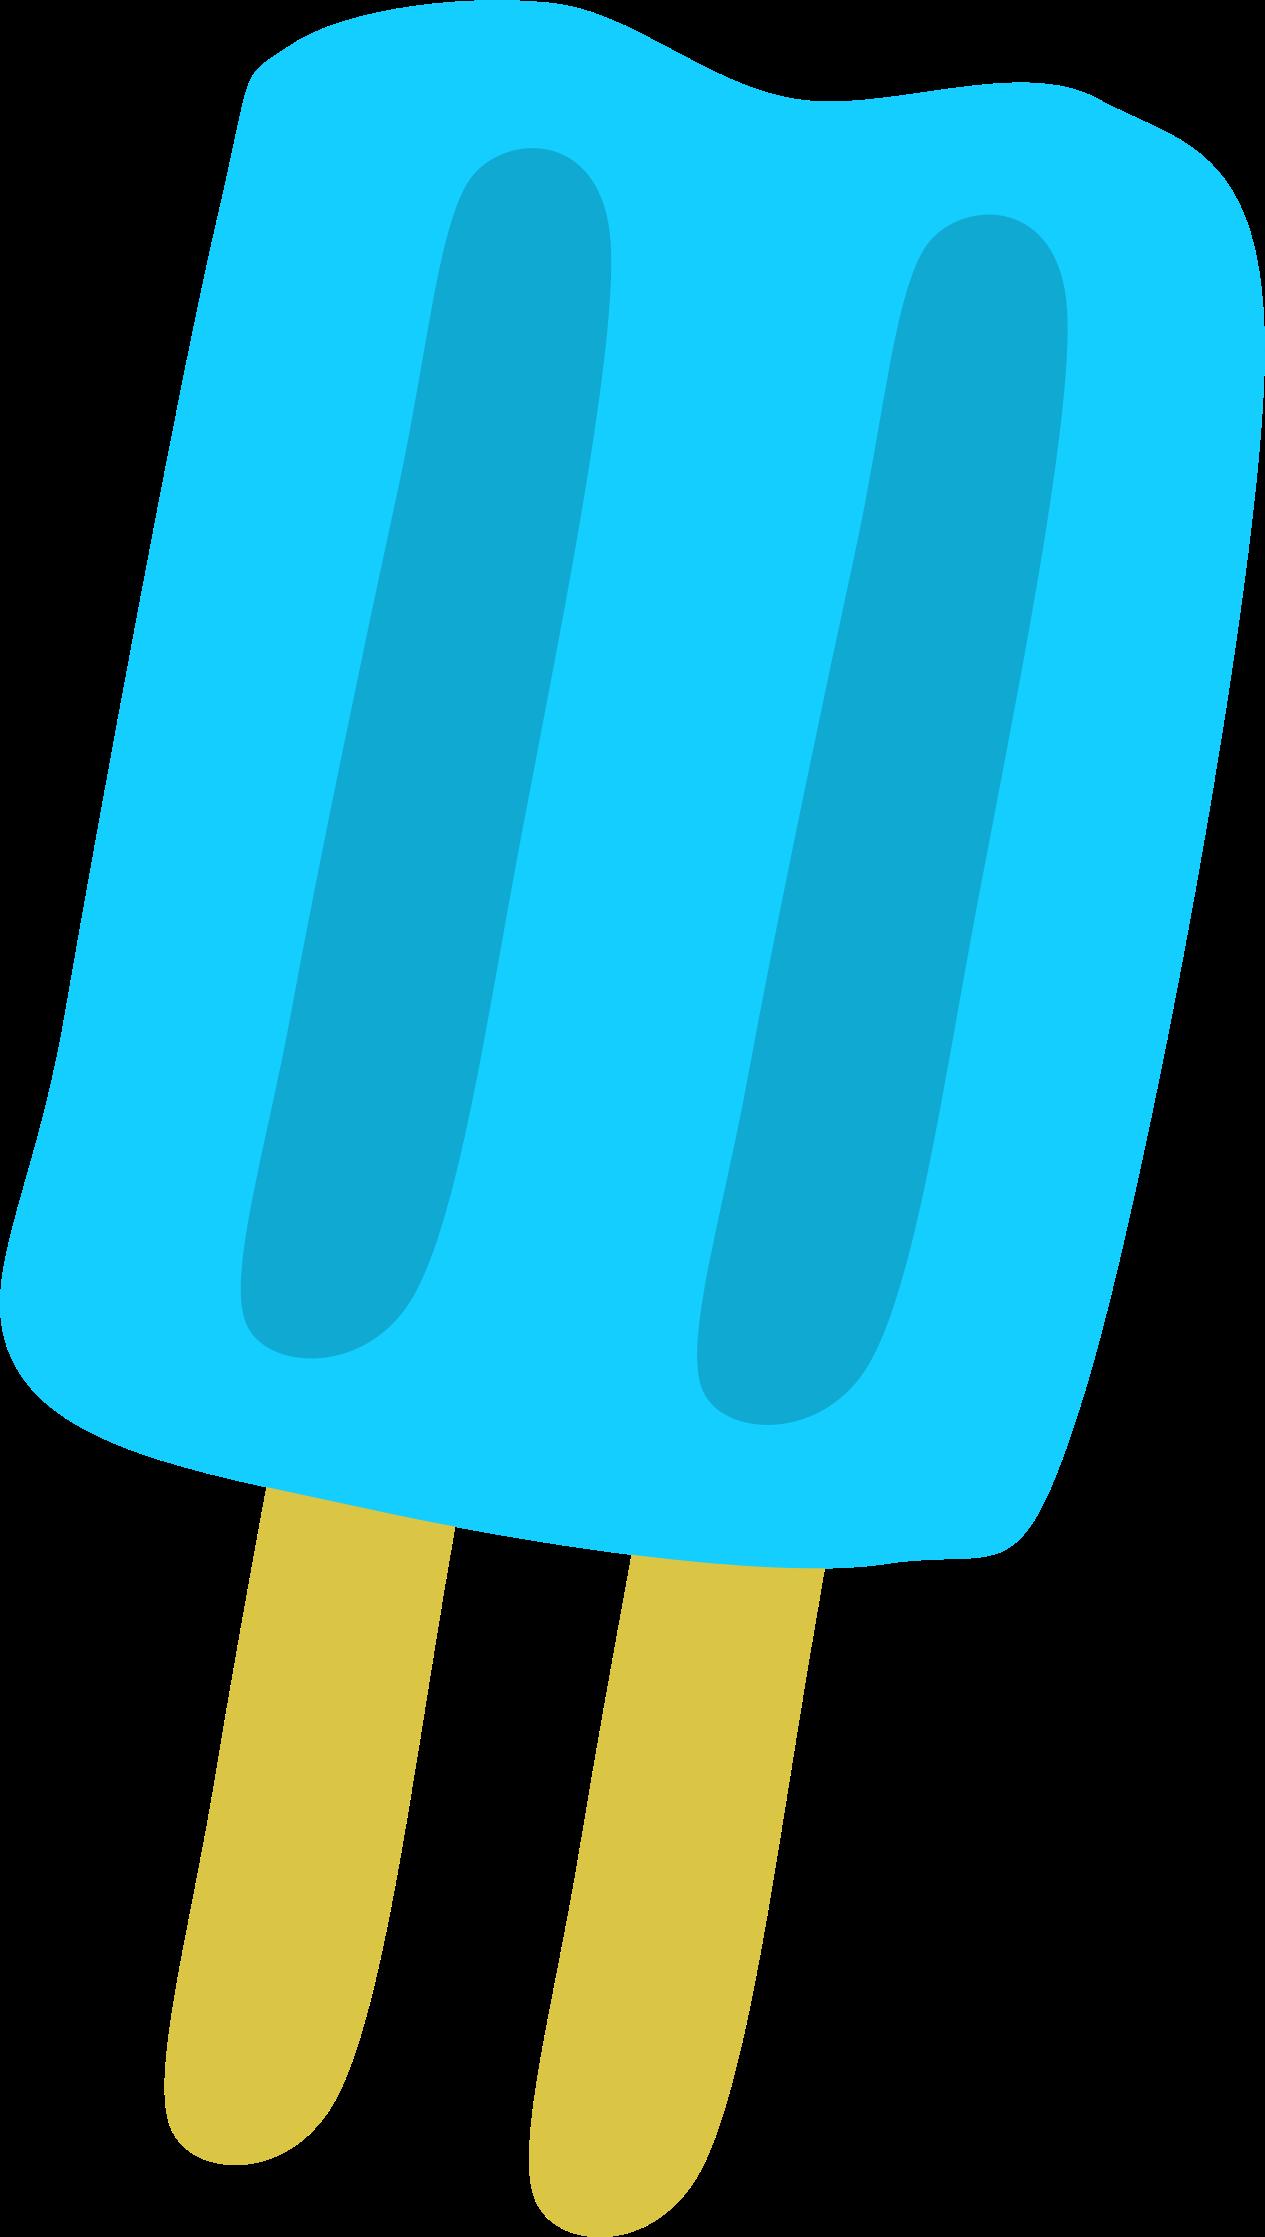 Popsicle clip art at vector clip art.